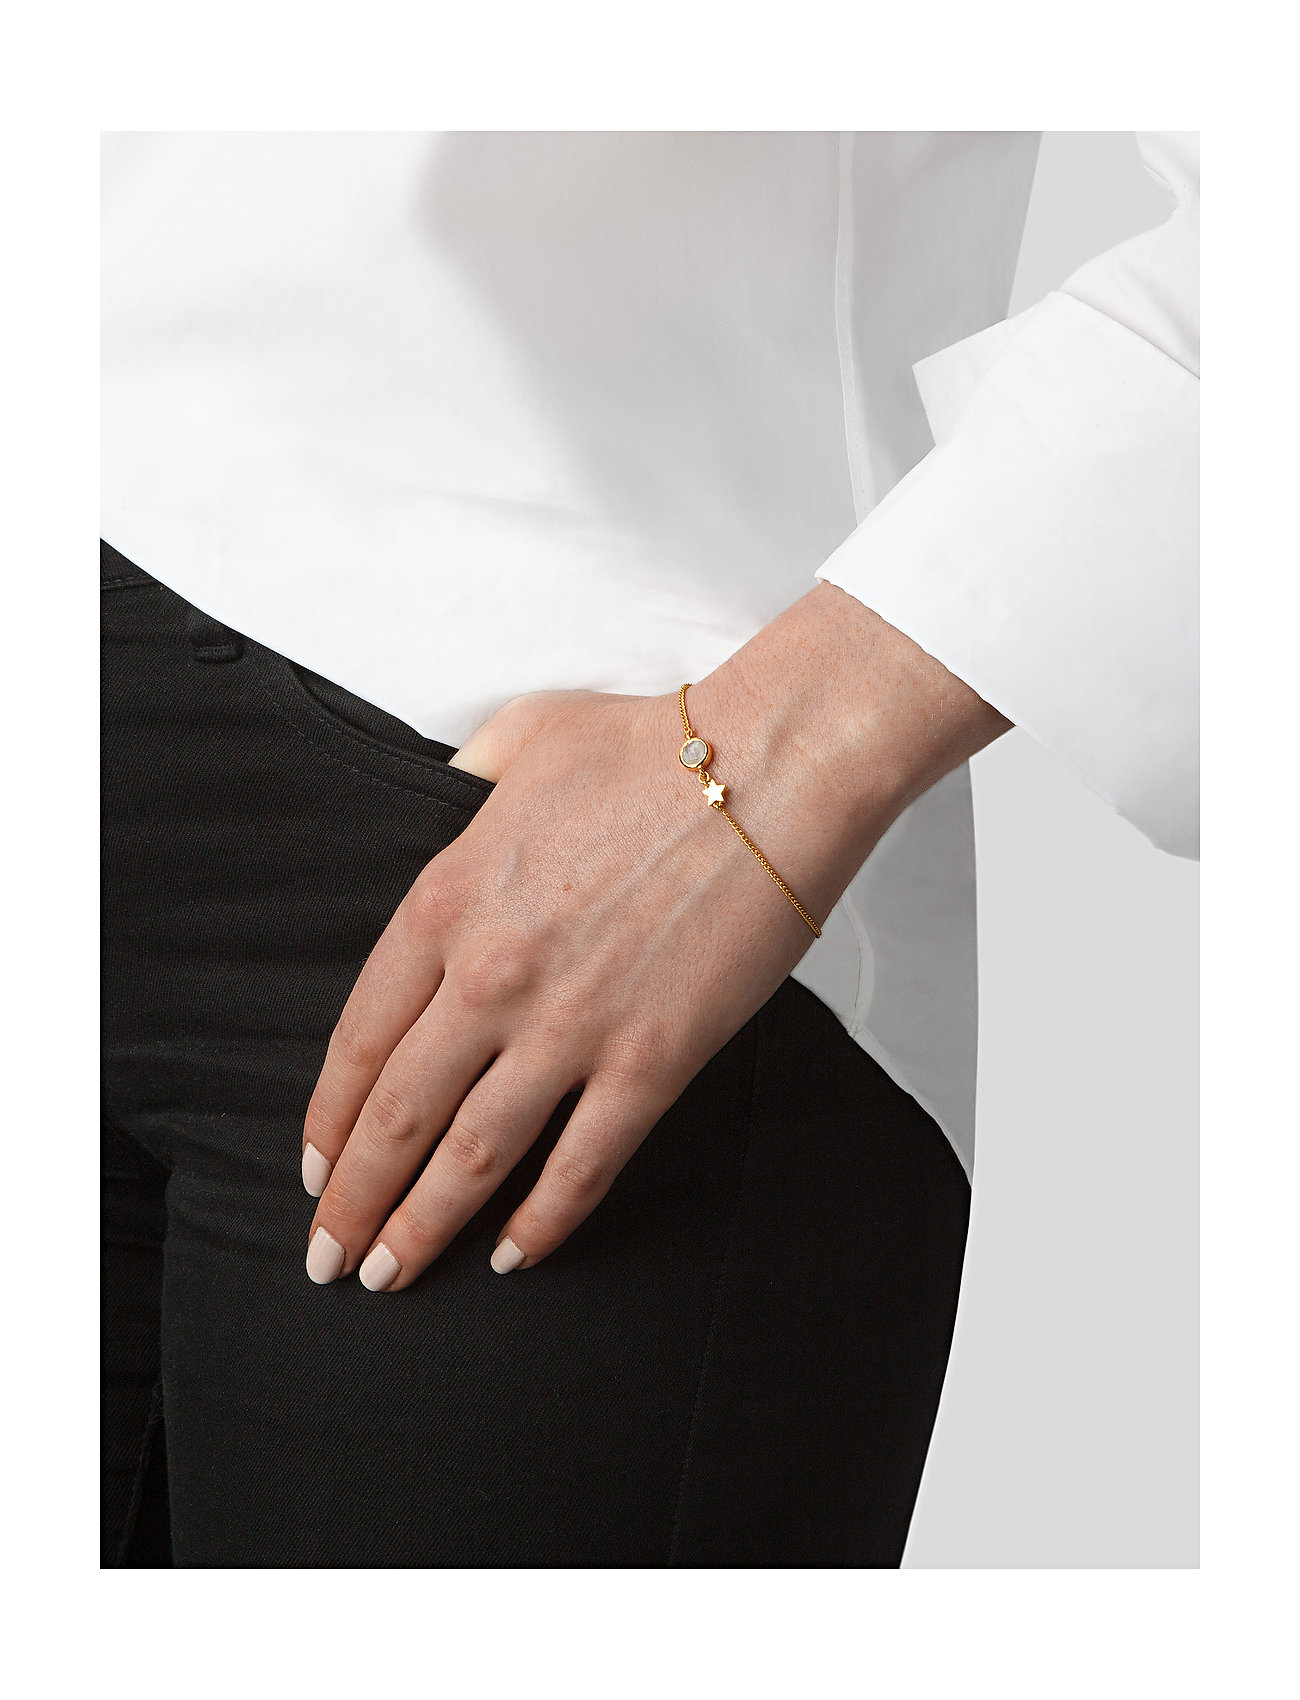 Syster P Priscilla Bracelet Gold Moonstone - Bijouterie Exclusif